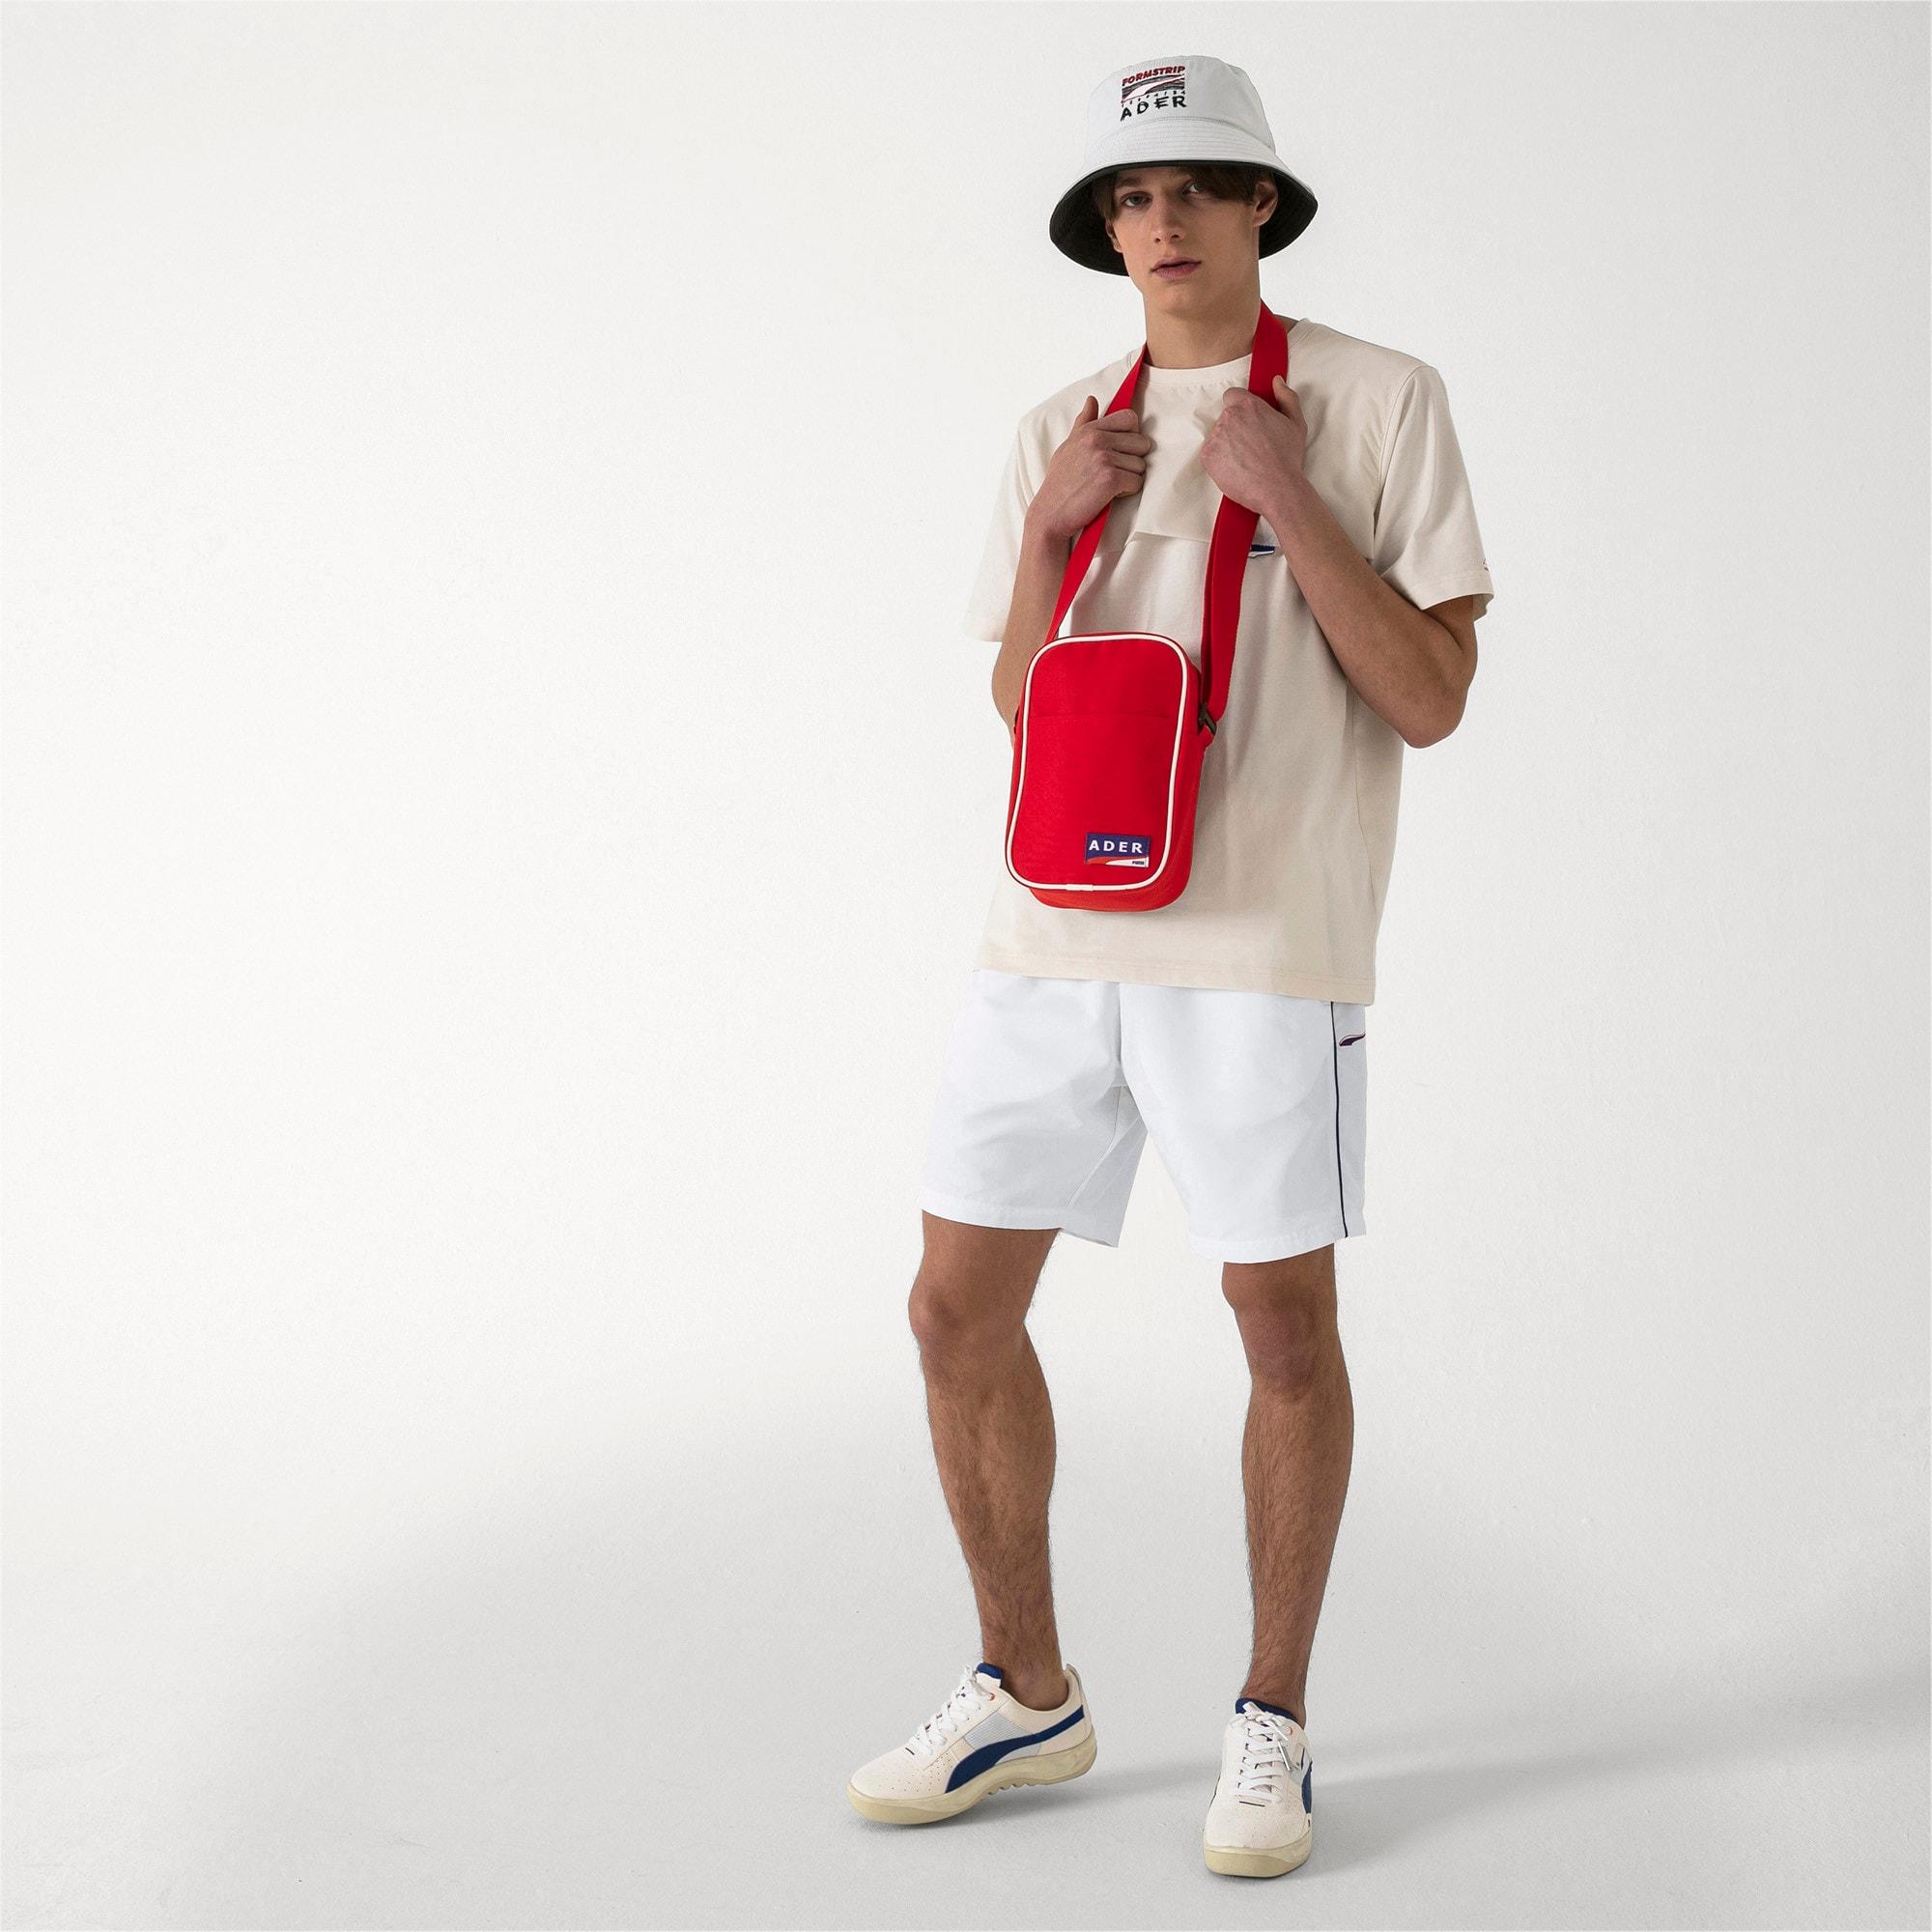 Thumbnail 2 of PUMA x ADER ERROR Portable Bag, Puma Red, medium